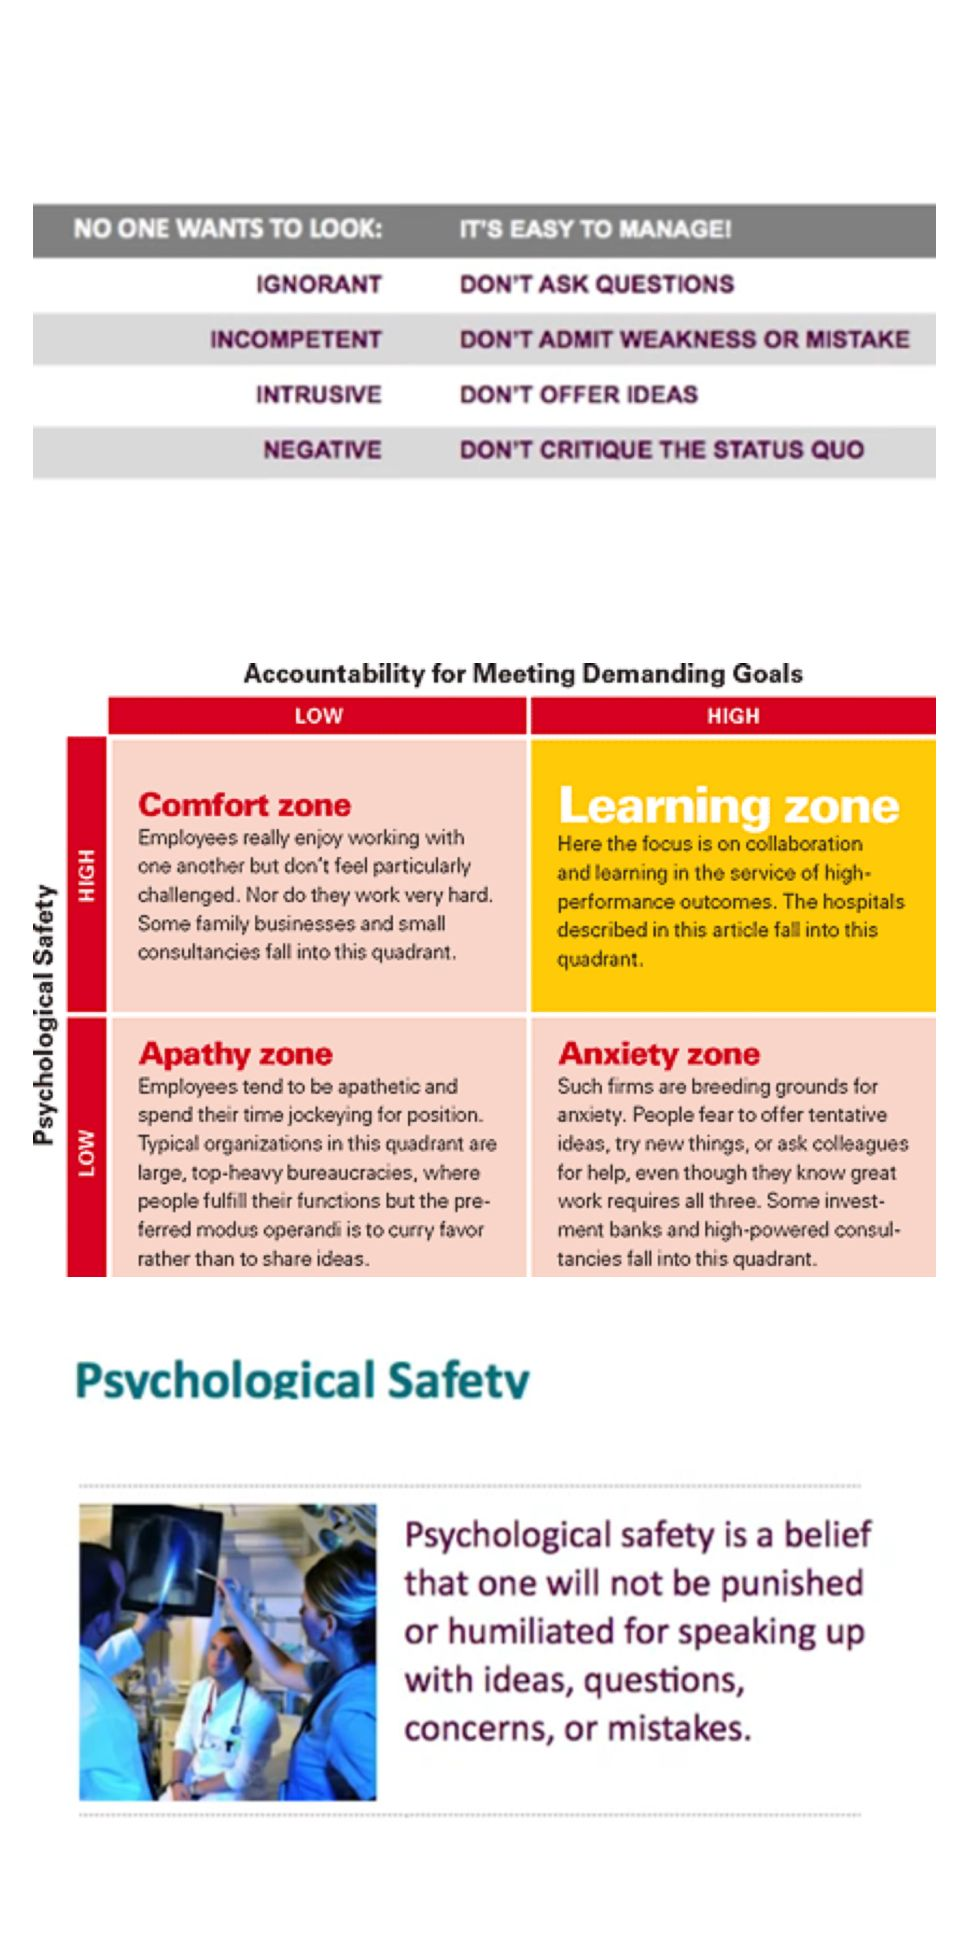 Psychological Safety Harvard business school, Leadership